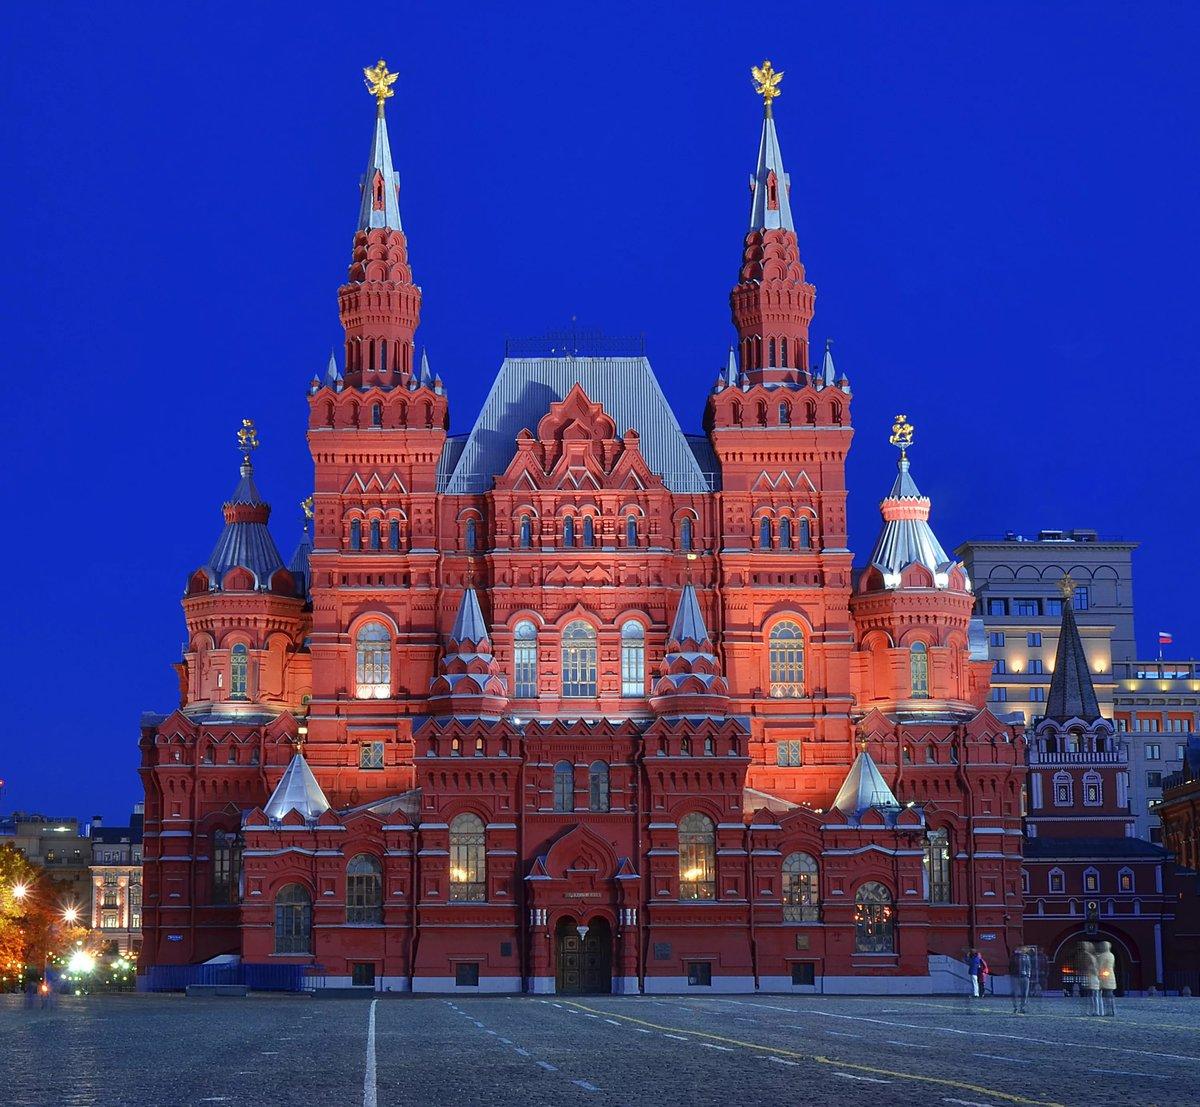 Музеи москвы картинки и названия, приколы картинки